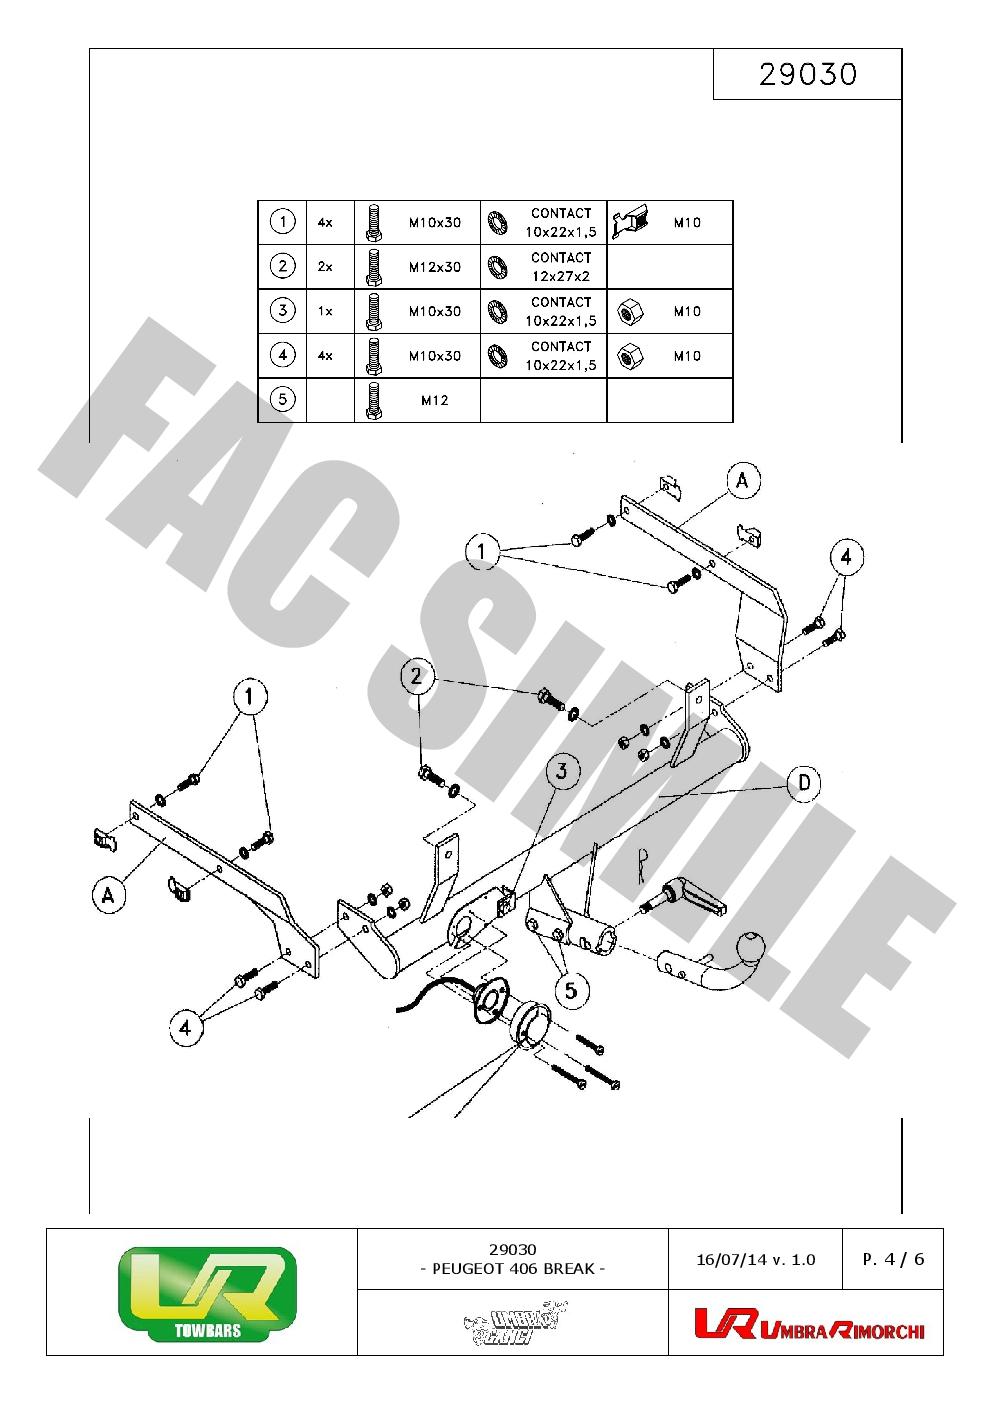 Detachable-Towbar-7-pin-kit-wiring-bypass-relay-